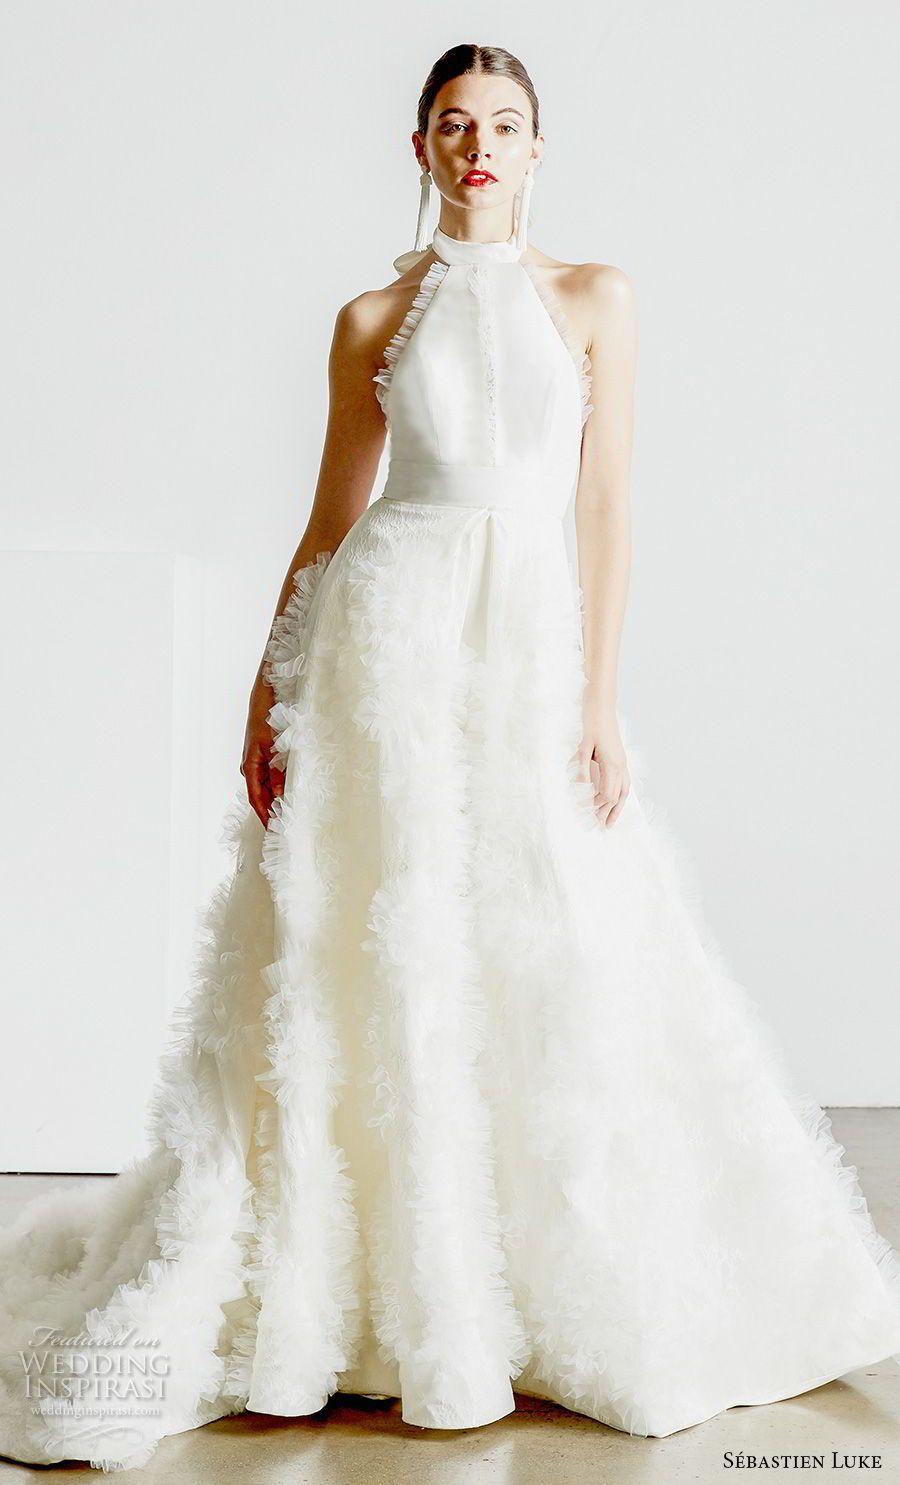 c500695e159b6 sebastien luke spring 2019 bridal halter high neck simple minimalist modern  ankle jumpsuit wedding dress a line overskirt open back chapel train (4) mv